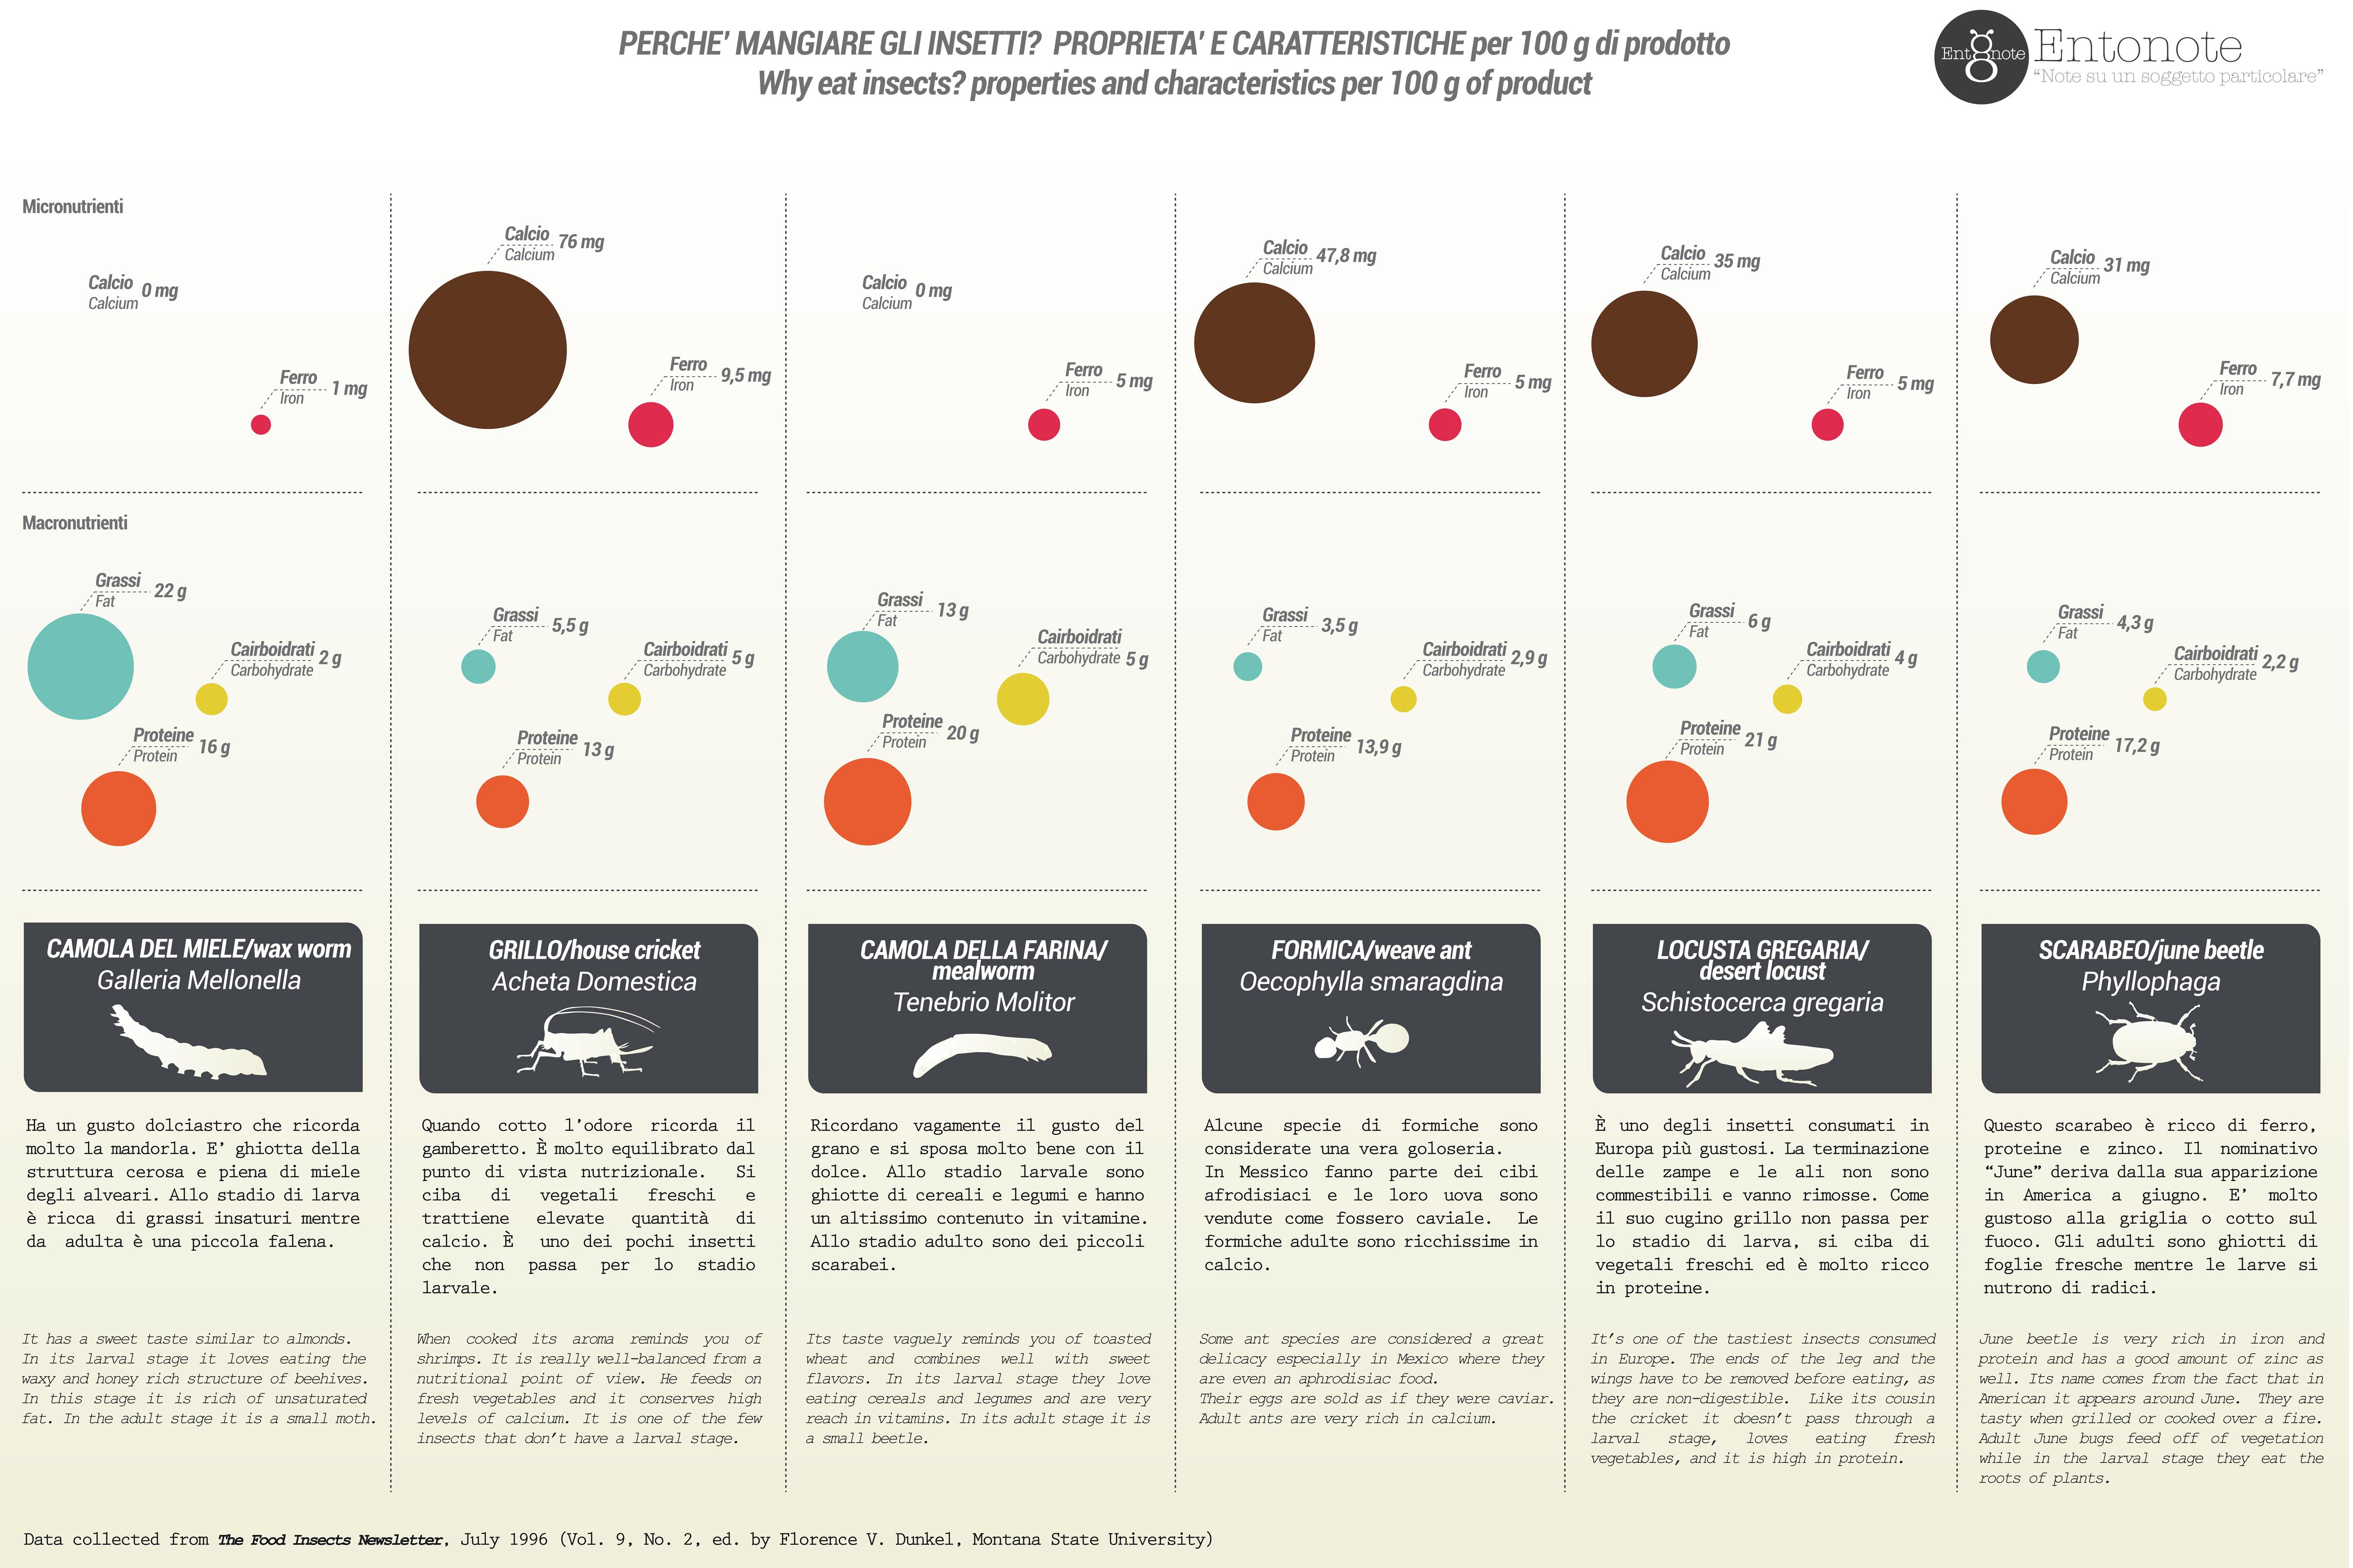 infografica valori nutrizionali entonote